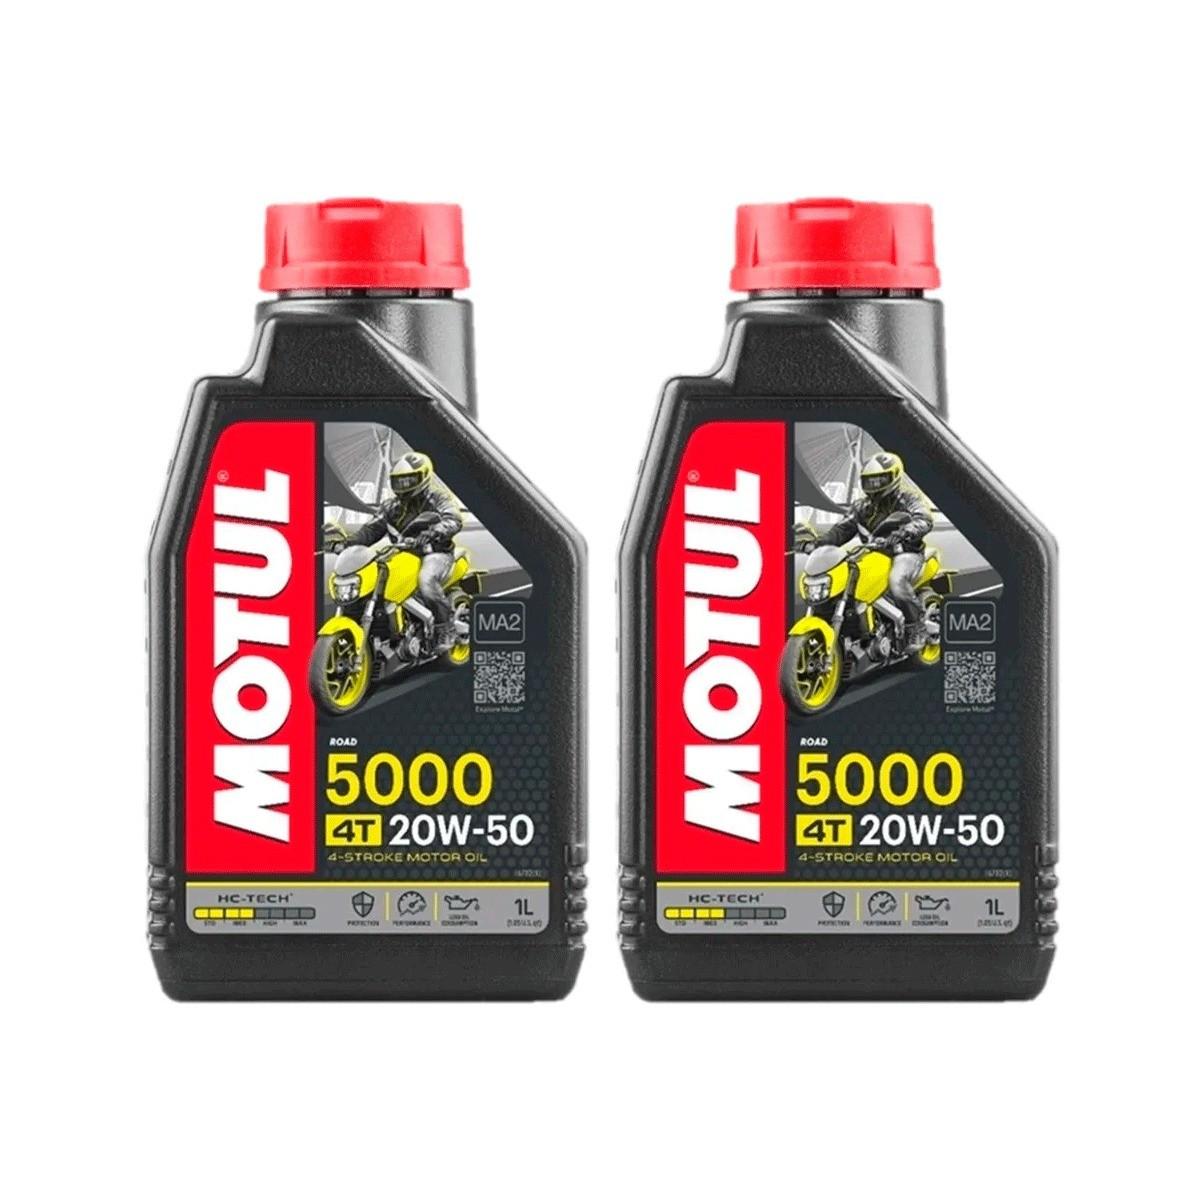 Óleo Motul 5000 4t 20w-50 Hc-tech Semissintético 2 Litros